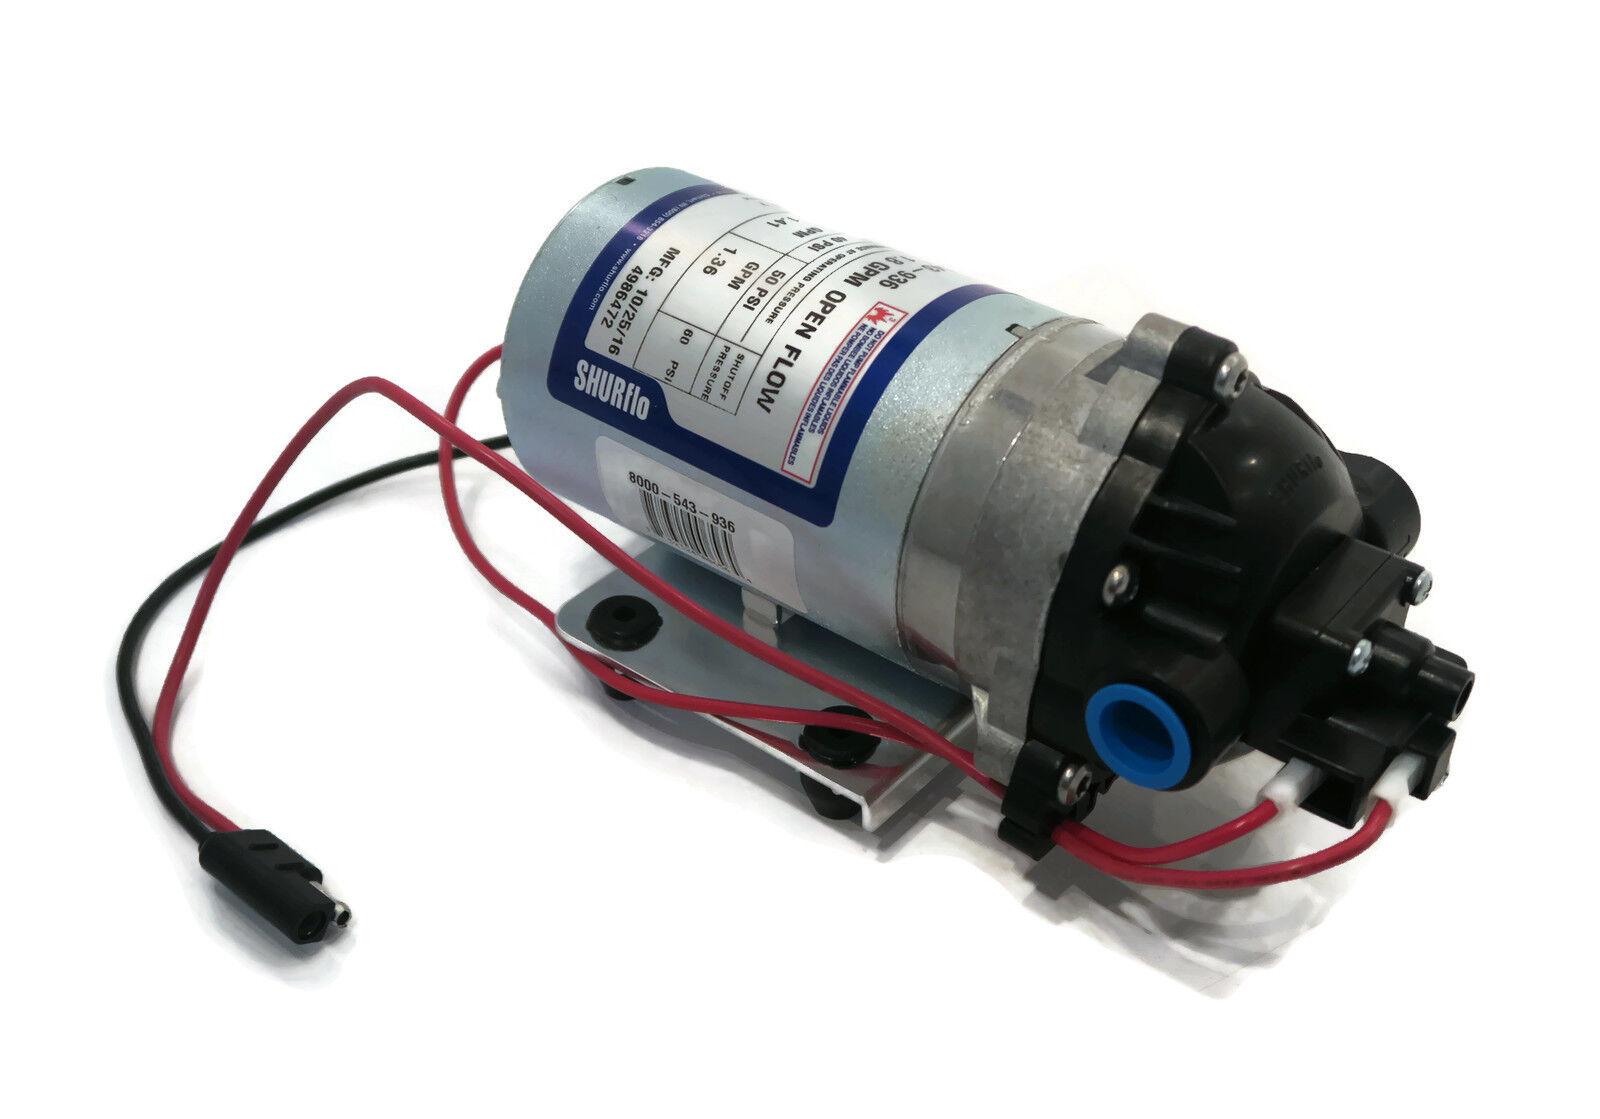 shurflo pump wiring solution of your wiring diagram guide • new shurflo pump 1 8 gpm 8000 543 936 for industrial residential rh co uk shurflo 12v water pump wiring diagram shur flo 12 volt pumps